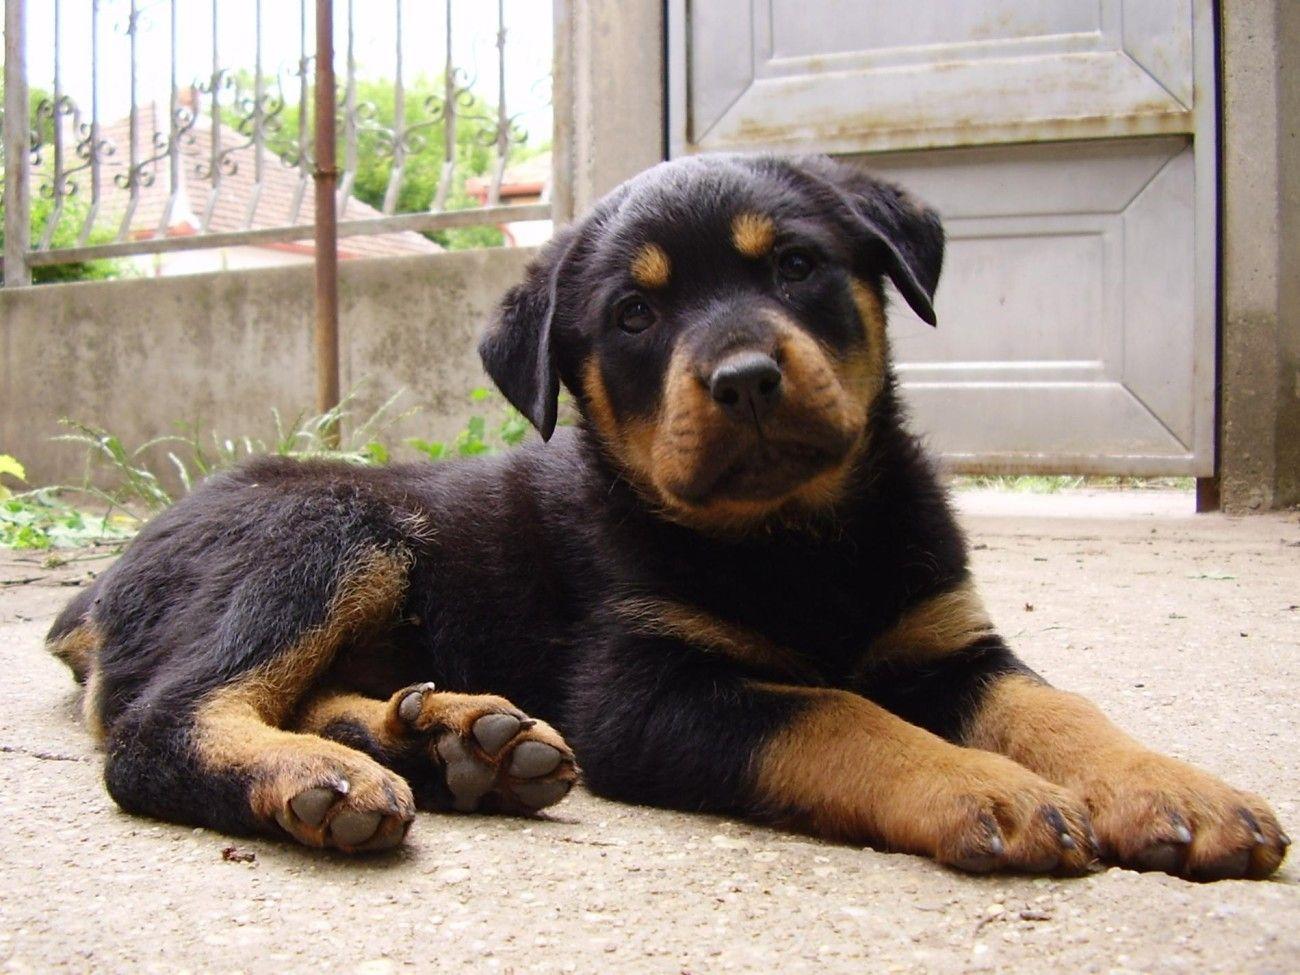 Rottweiler Puppy Rottweiler puppies, Puppies